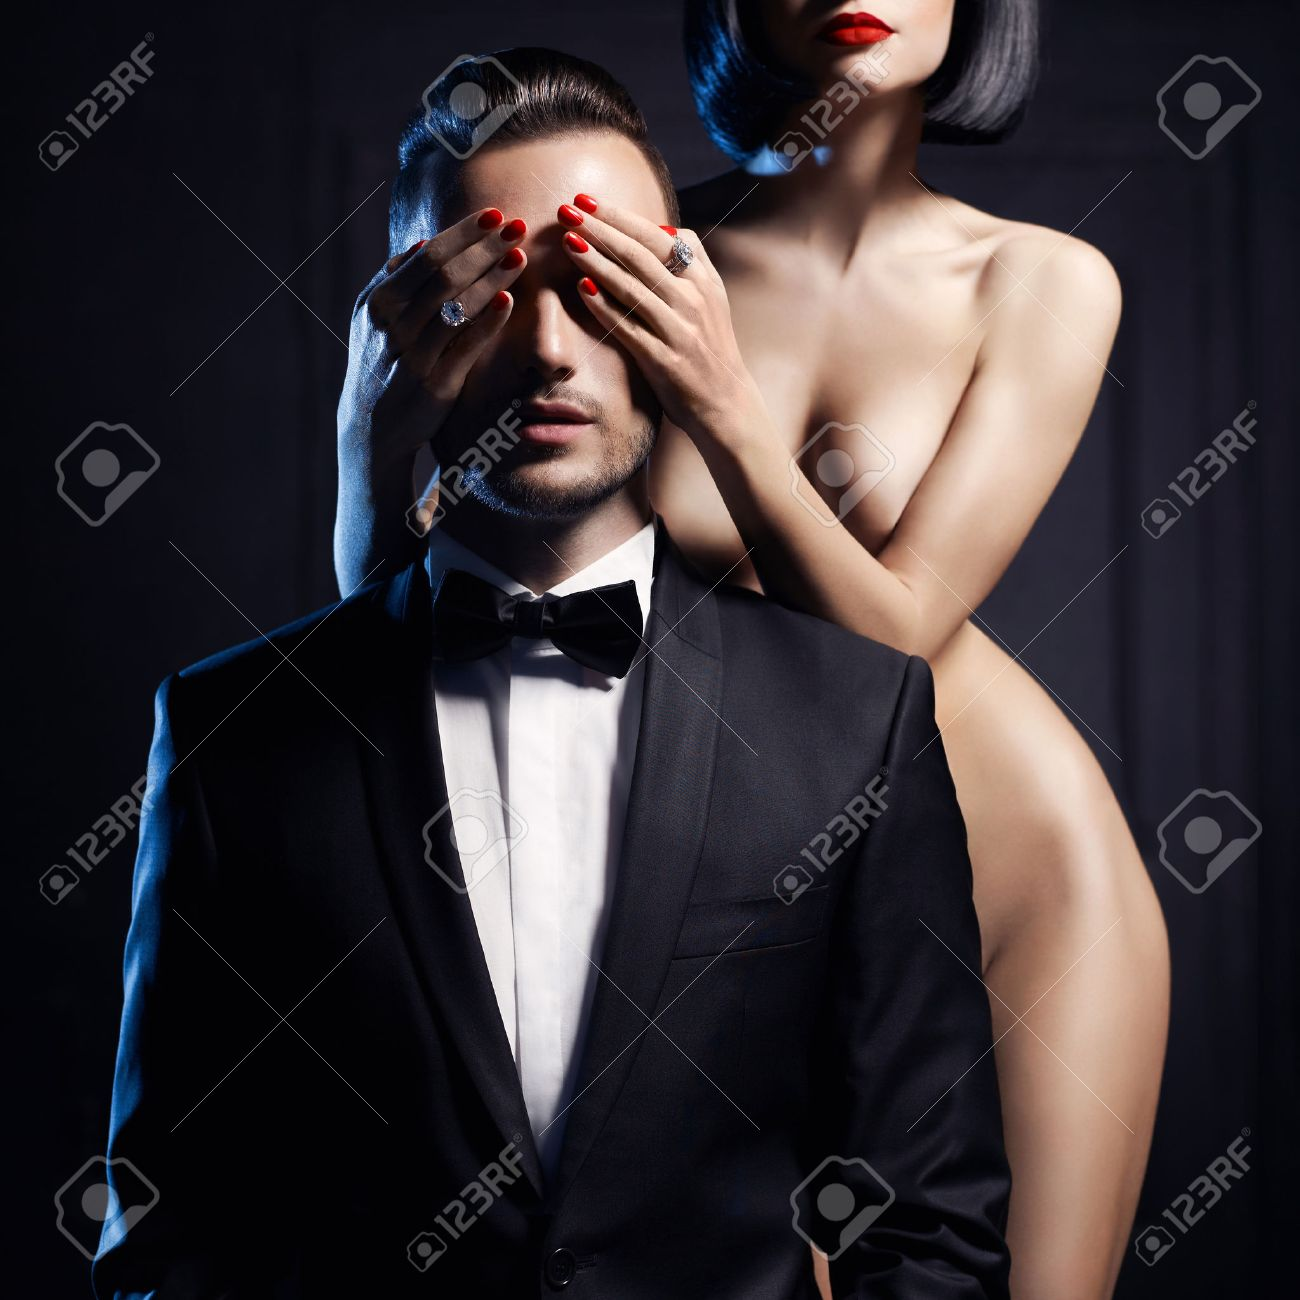 Fashion studio photo of a sensual couple on black background Standard-Bild - 36665797